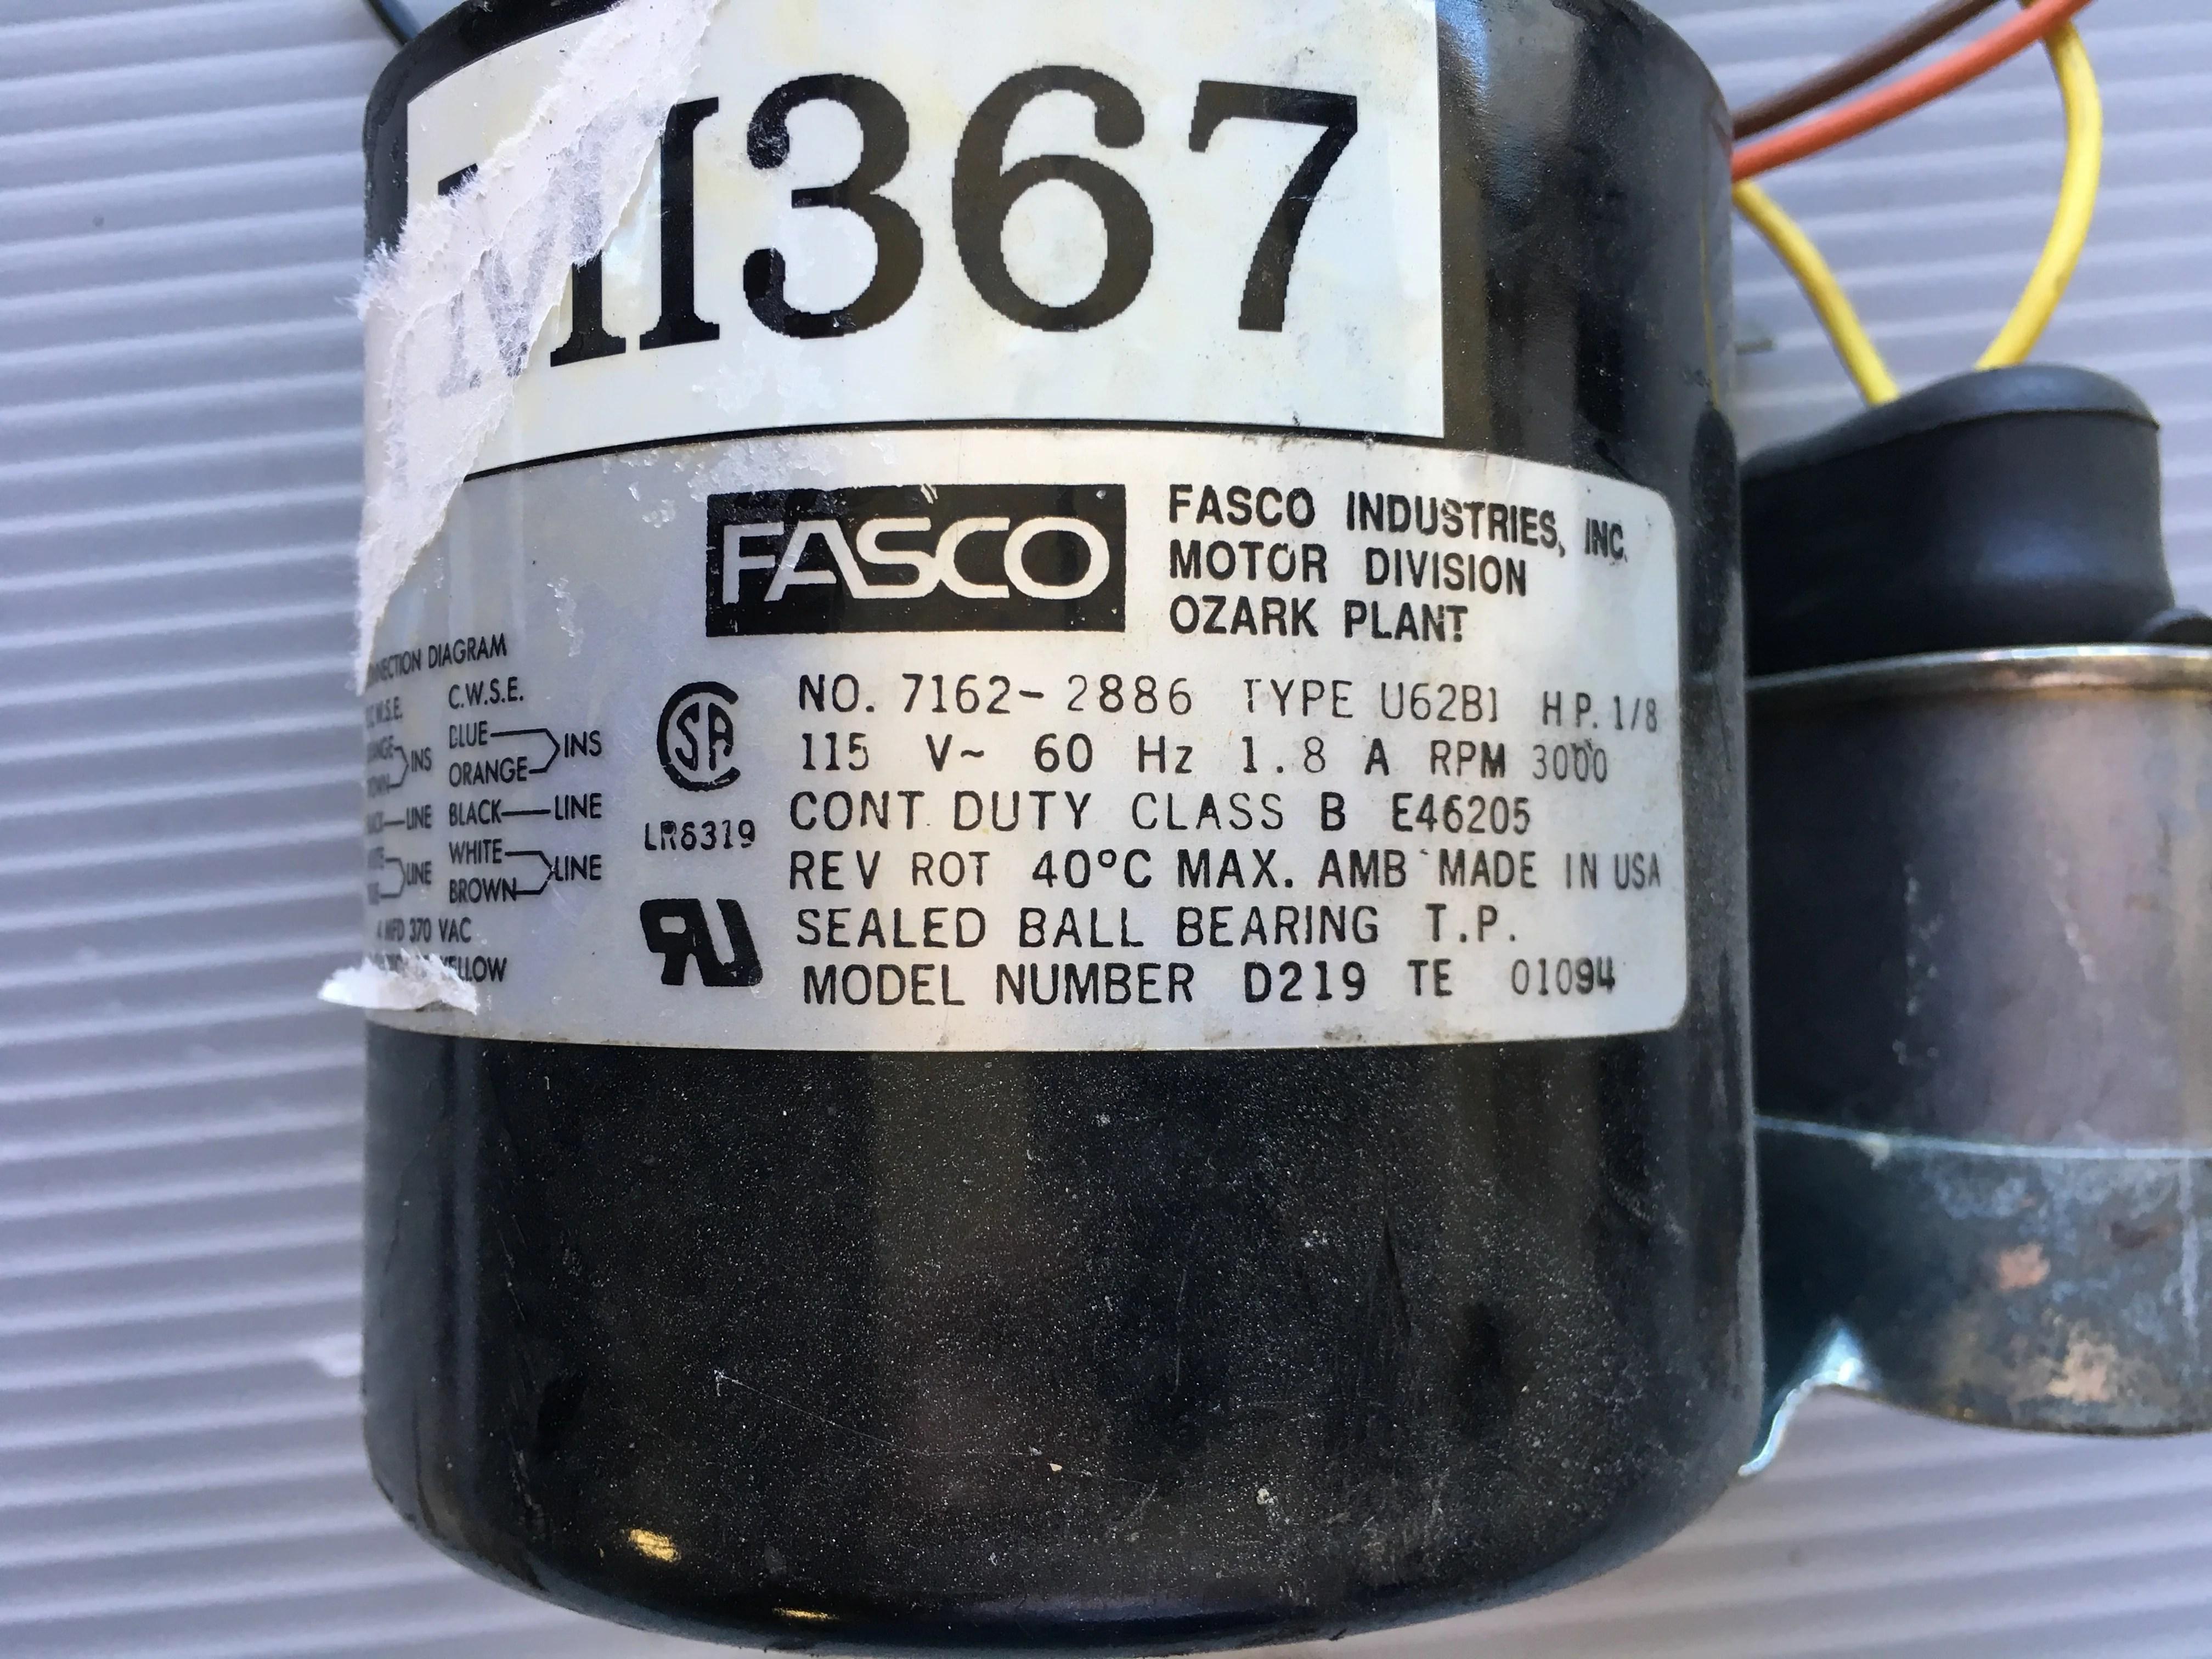 hight resolution of fasco motor u62b1 1 8 hp 3000 rpm 115 v metal logics inc empire wiring diagrams fasco type u62b1 wiring diagram